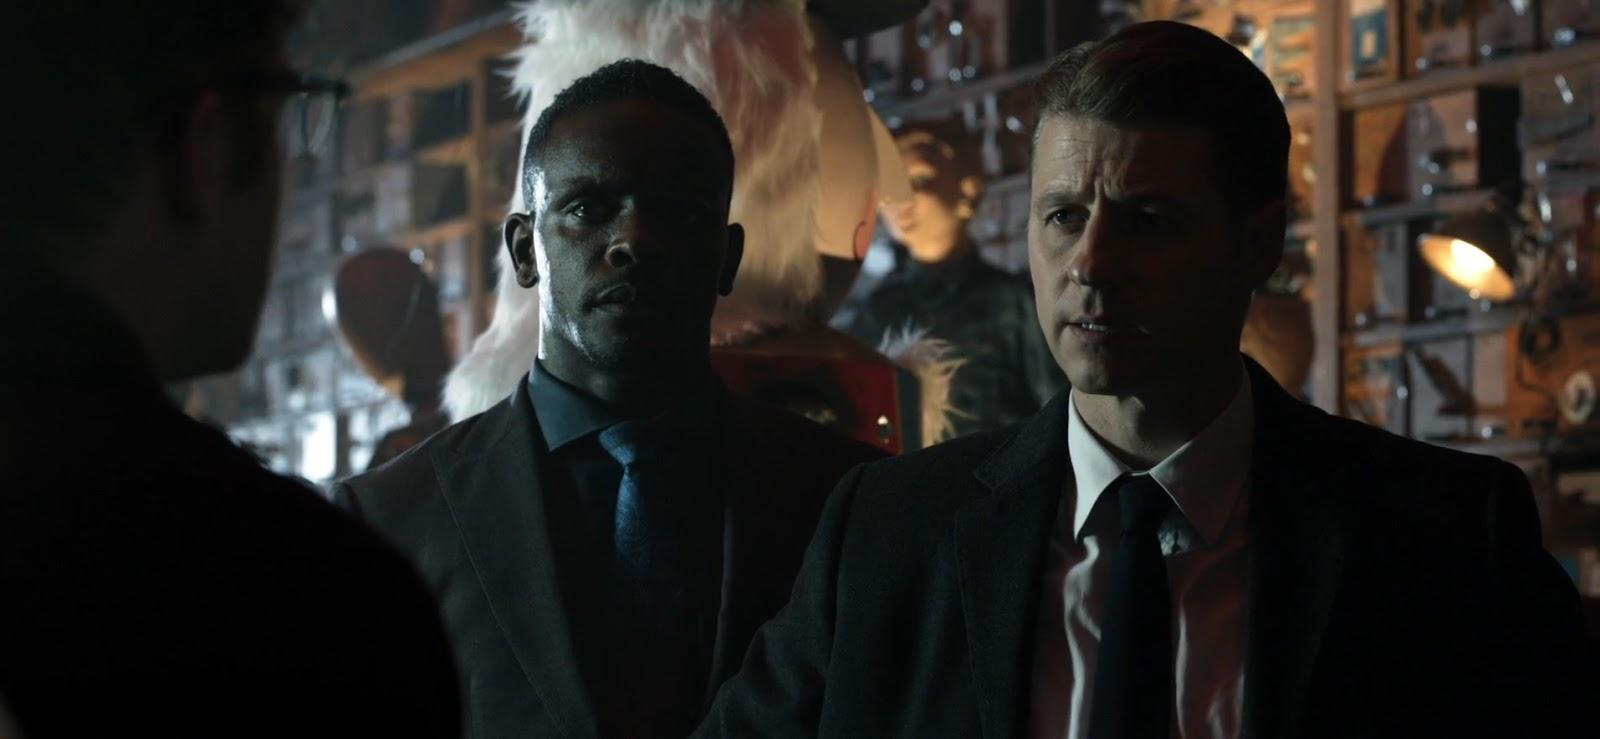 Gotham - Pieces of a Broken Mirror - Review